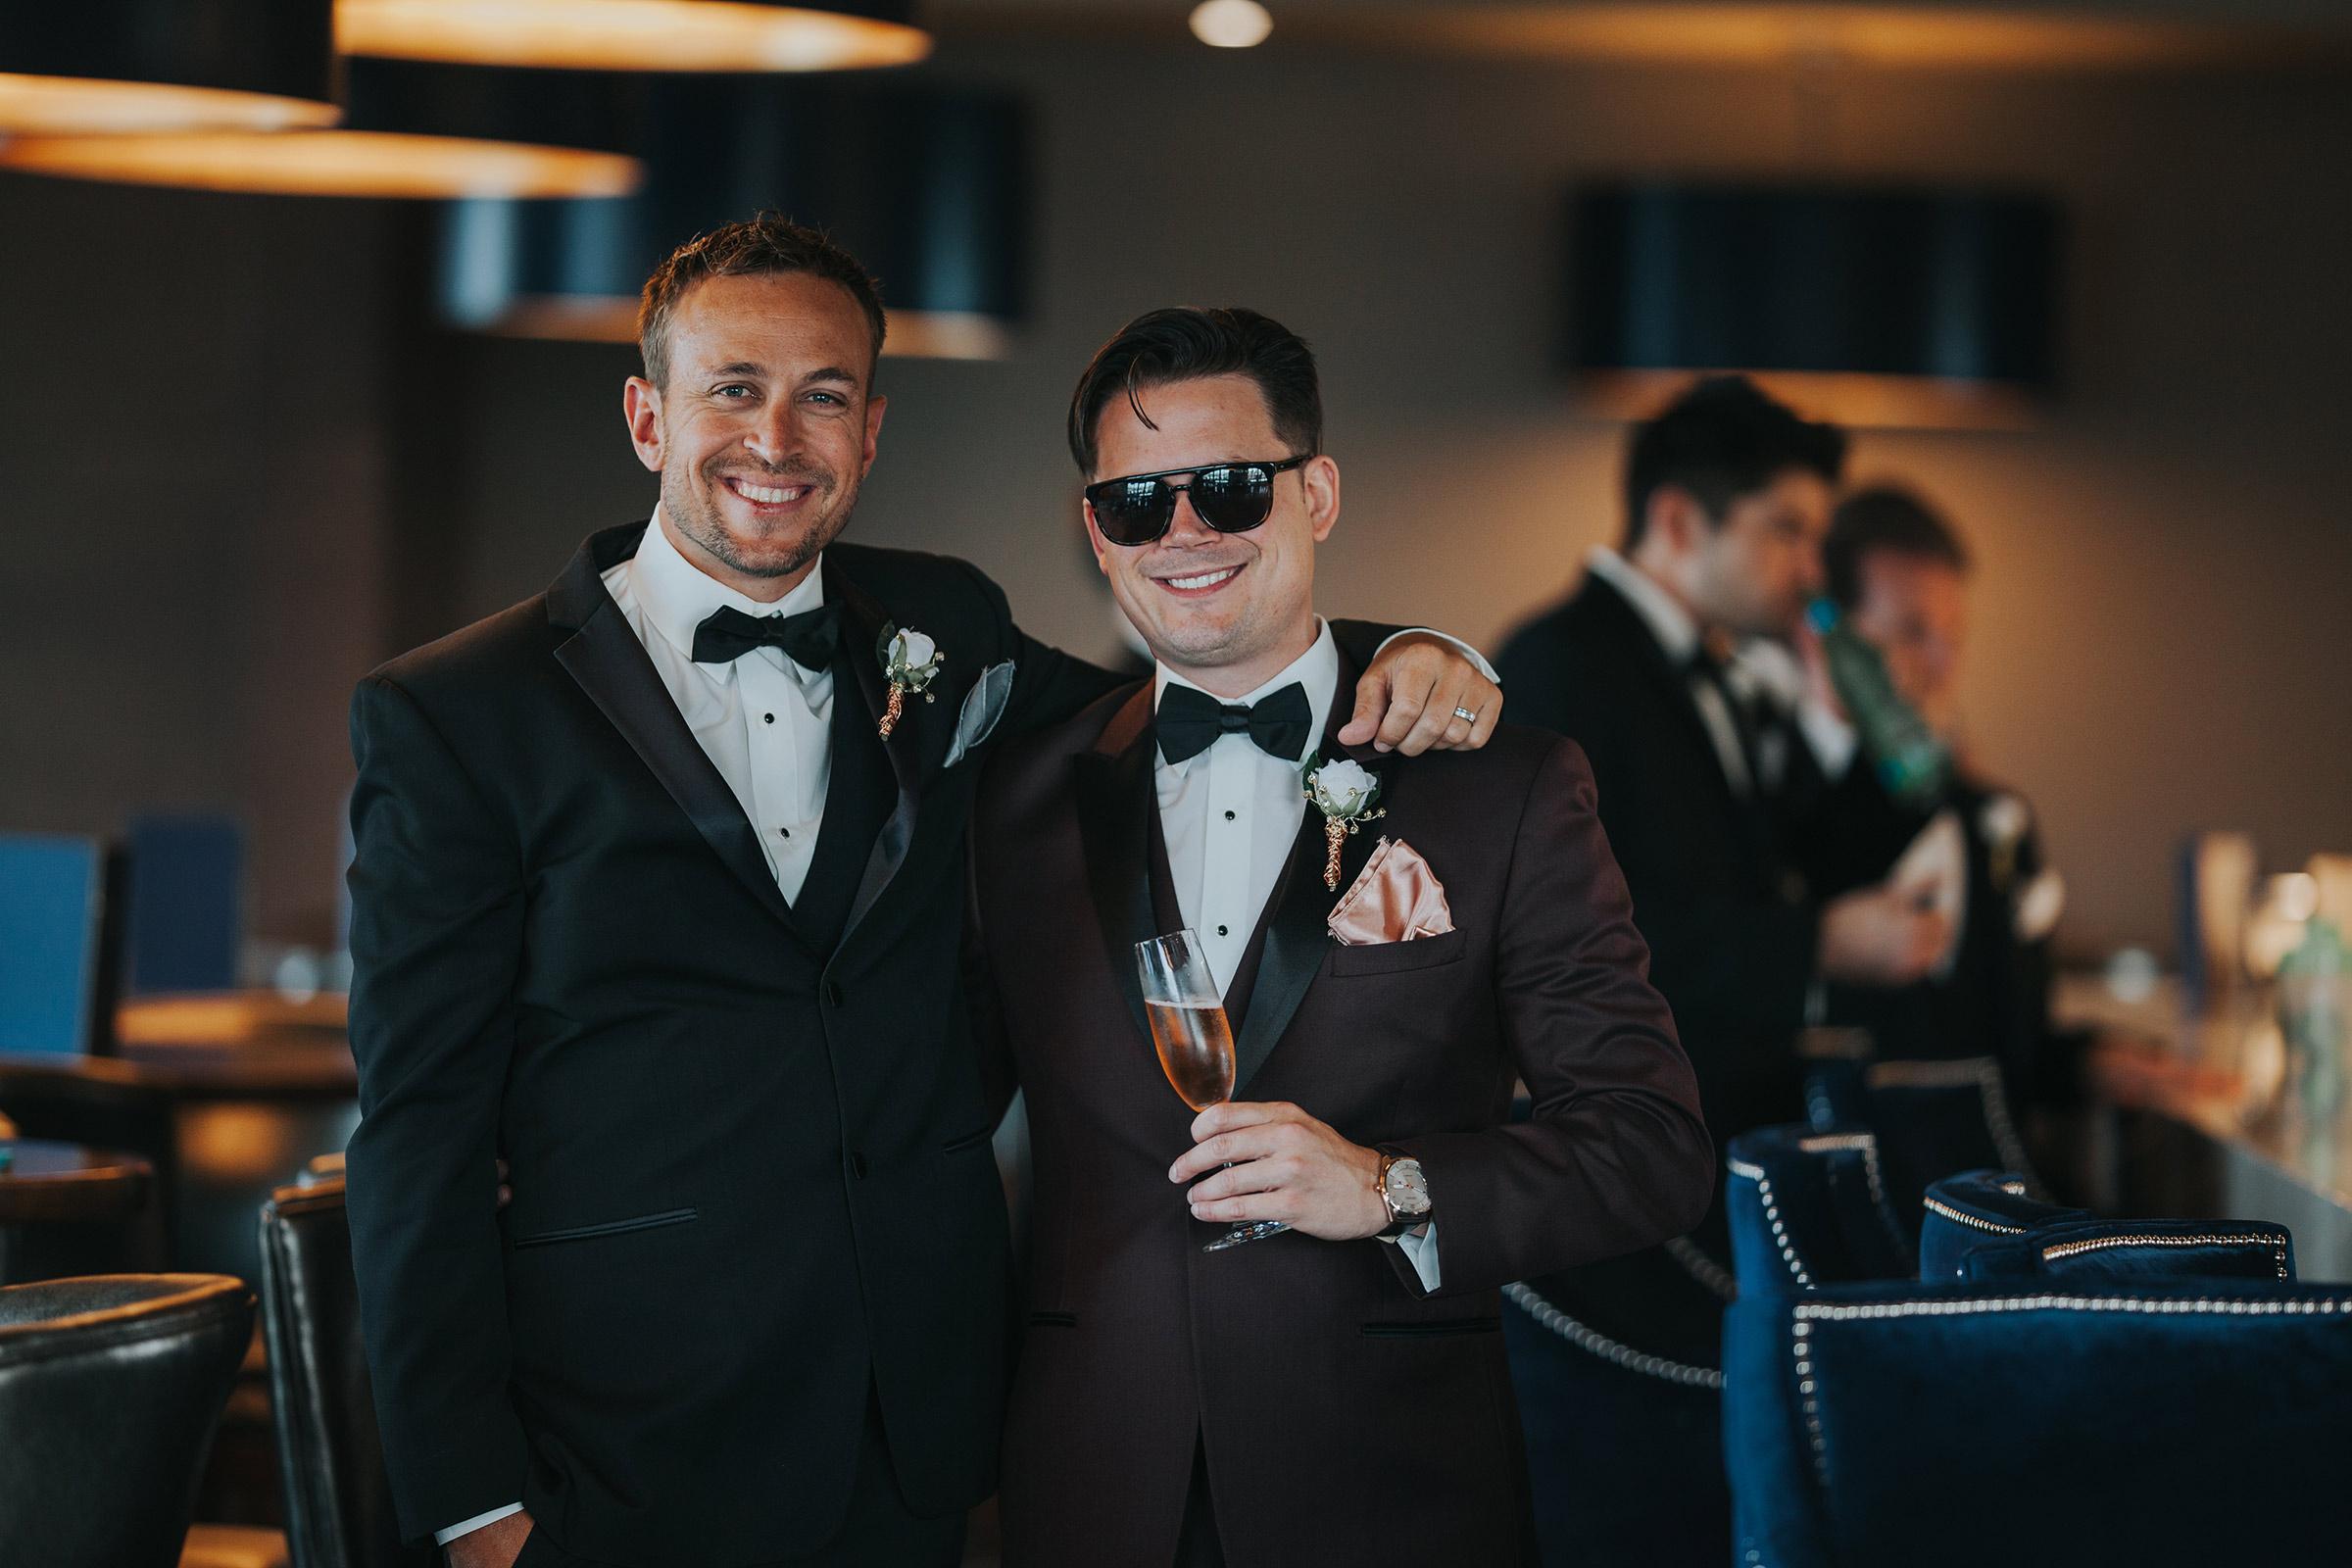 groom-posing-with-groomsmen-at-republic-on-grand-desmoines-iowa-ac-hotel-raelyn-ramey-photography.jpg